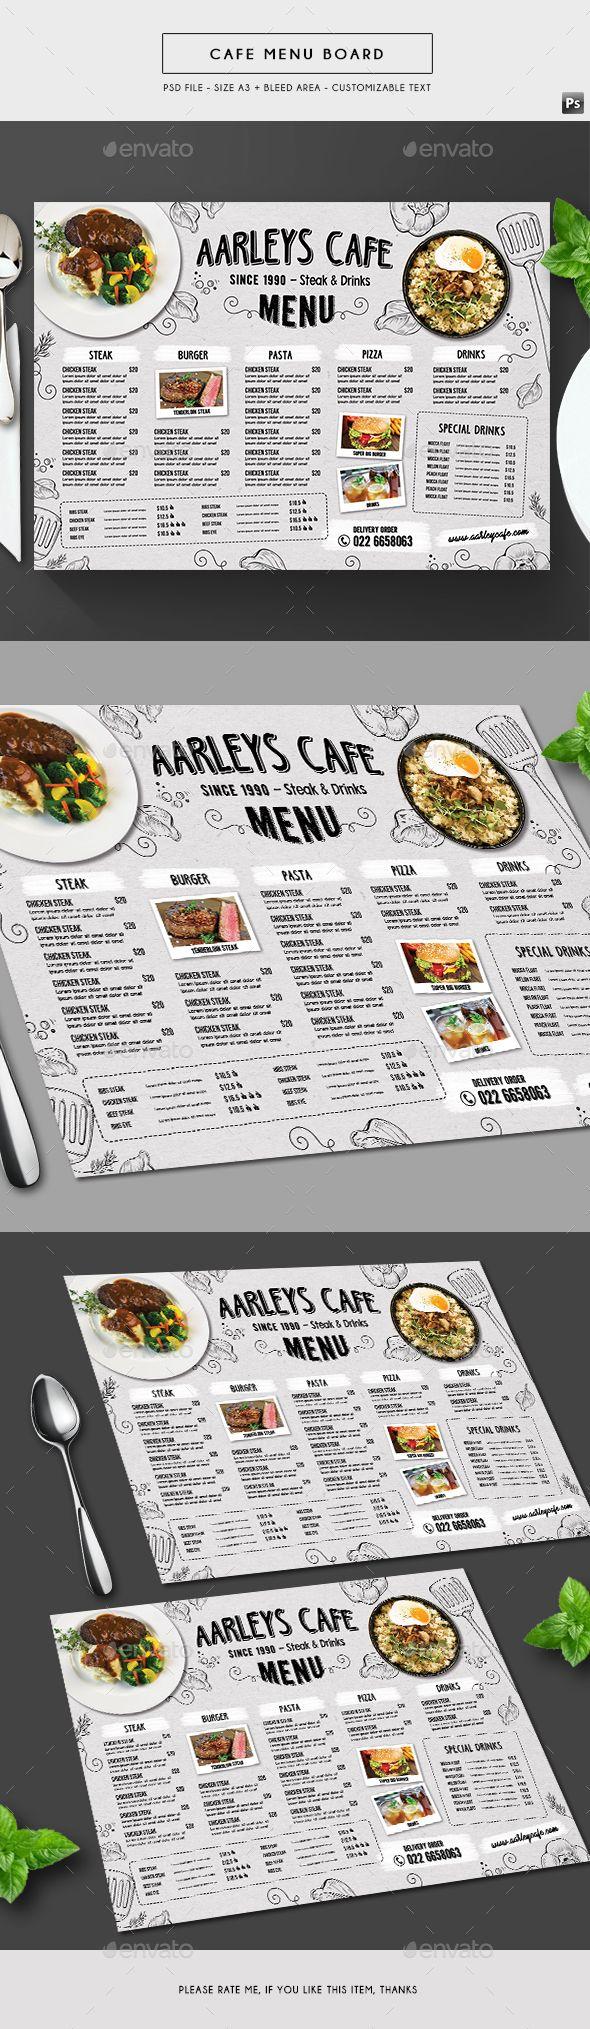 Doodle Cafe Menu Board — Photoshop PSD #restaurant menu #elegant • Available here → https://graphicriver.net/item/doodle-cafe-menu-board/19666867?ref=pxcr